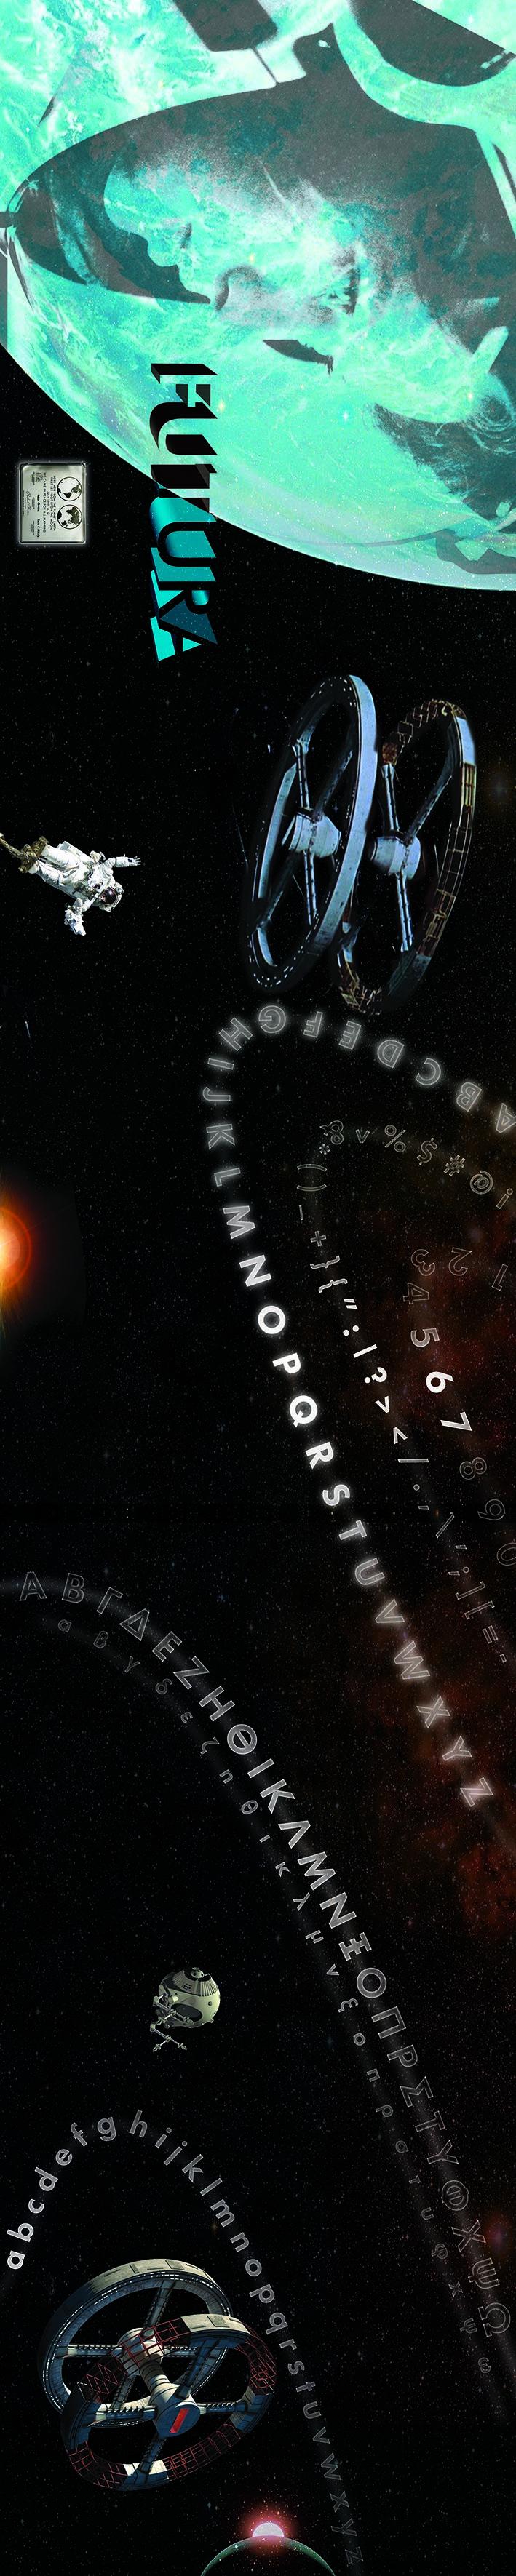 / Futura font panorama, Space Odyssey theme. // / Ανάπτυξη γραμματοσειράς Futura, με στοιχεία από την Οδύσσεια του Διαστήματος. //